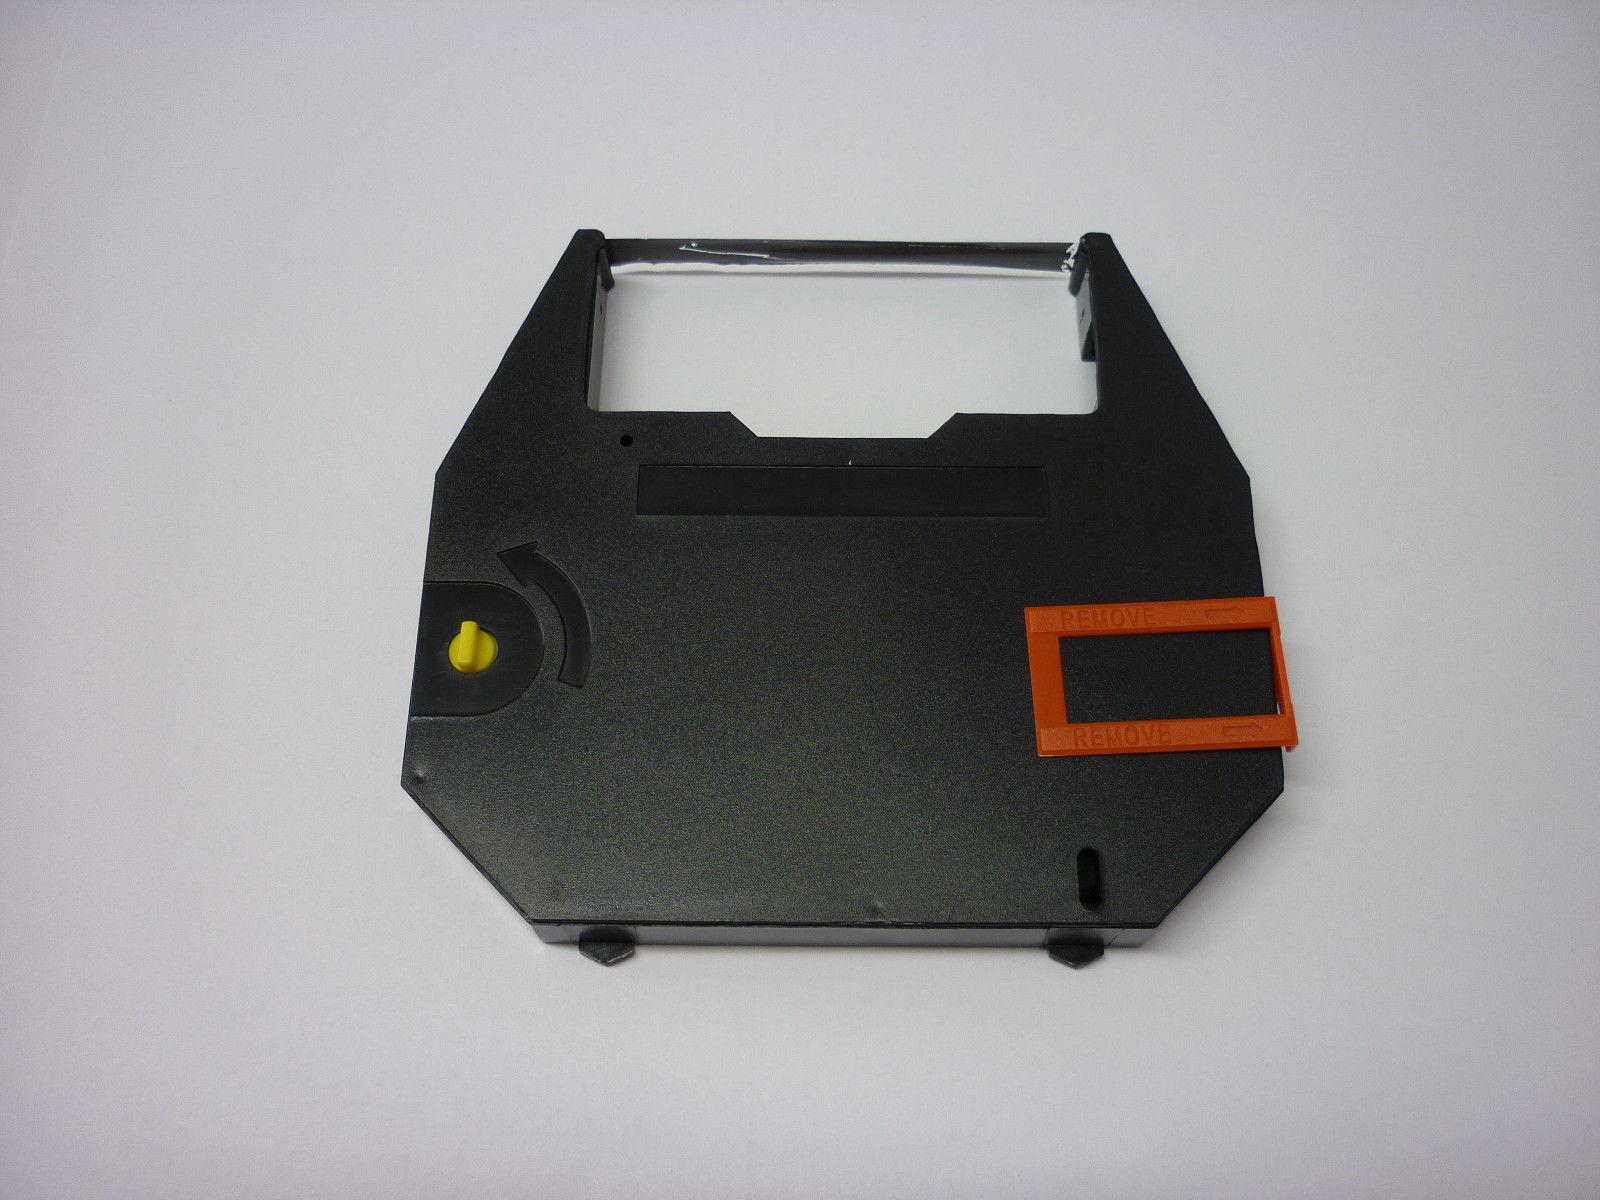 Swintec 2640 3200 3500 Typewriter Ribbon Correctable Replaces SWS 1045 (2 Pack)